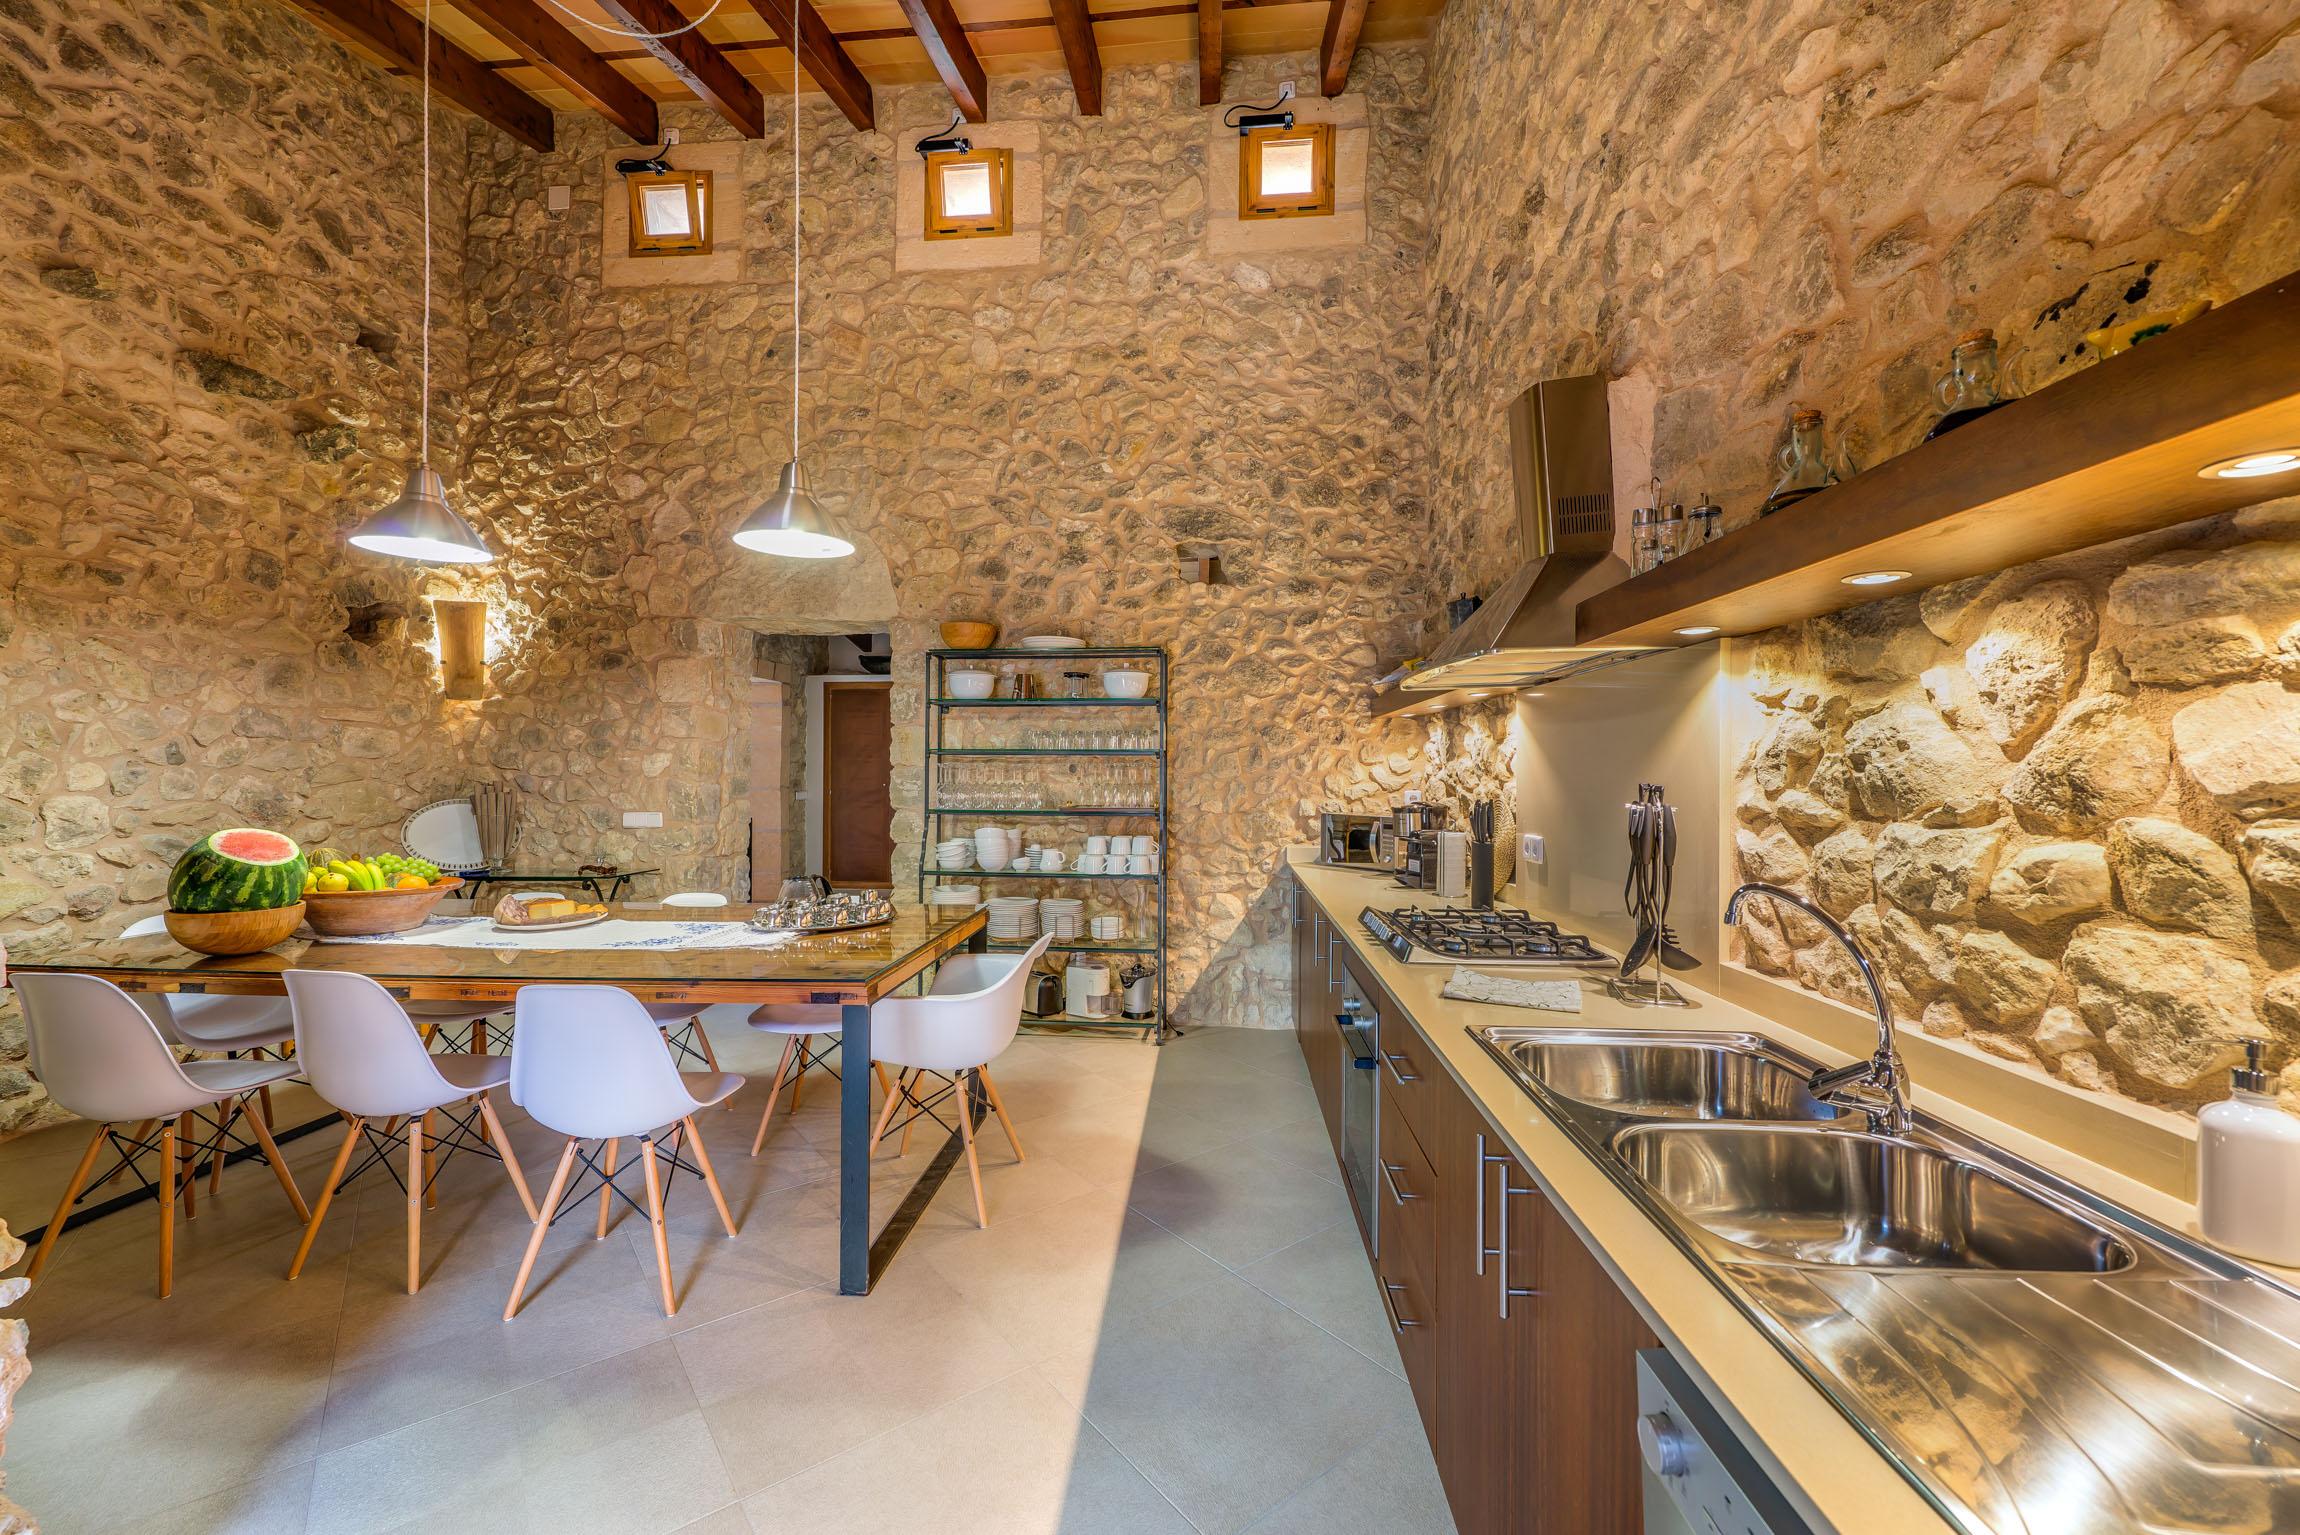 Ferienhaus SON DAVIU (1859500), Petra (ES), Mallorca, Balearische Inseln, Spanien, Bild 12